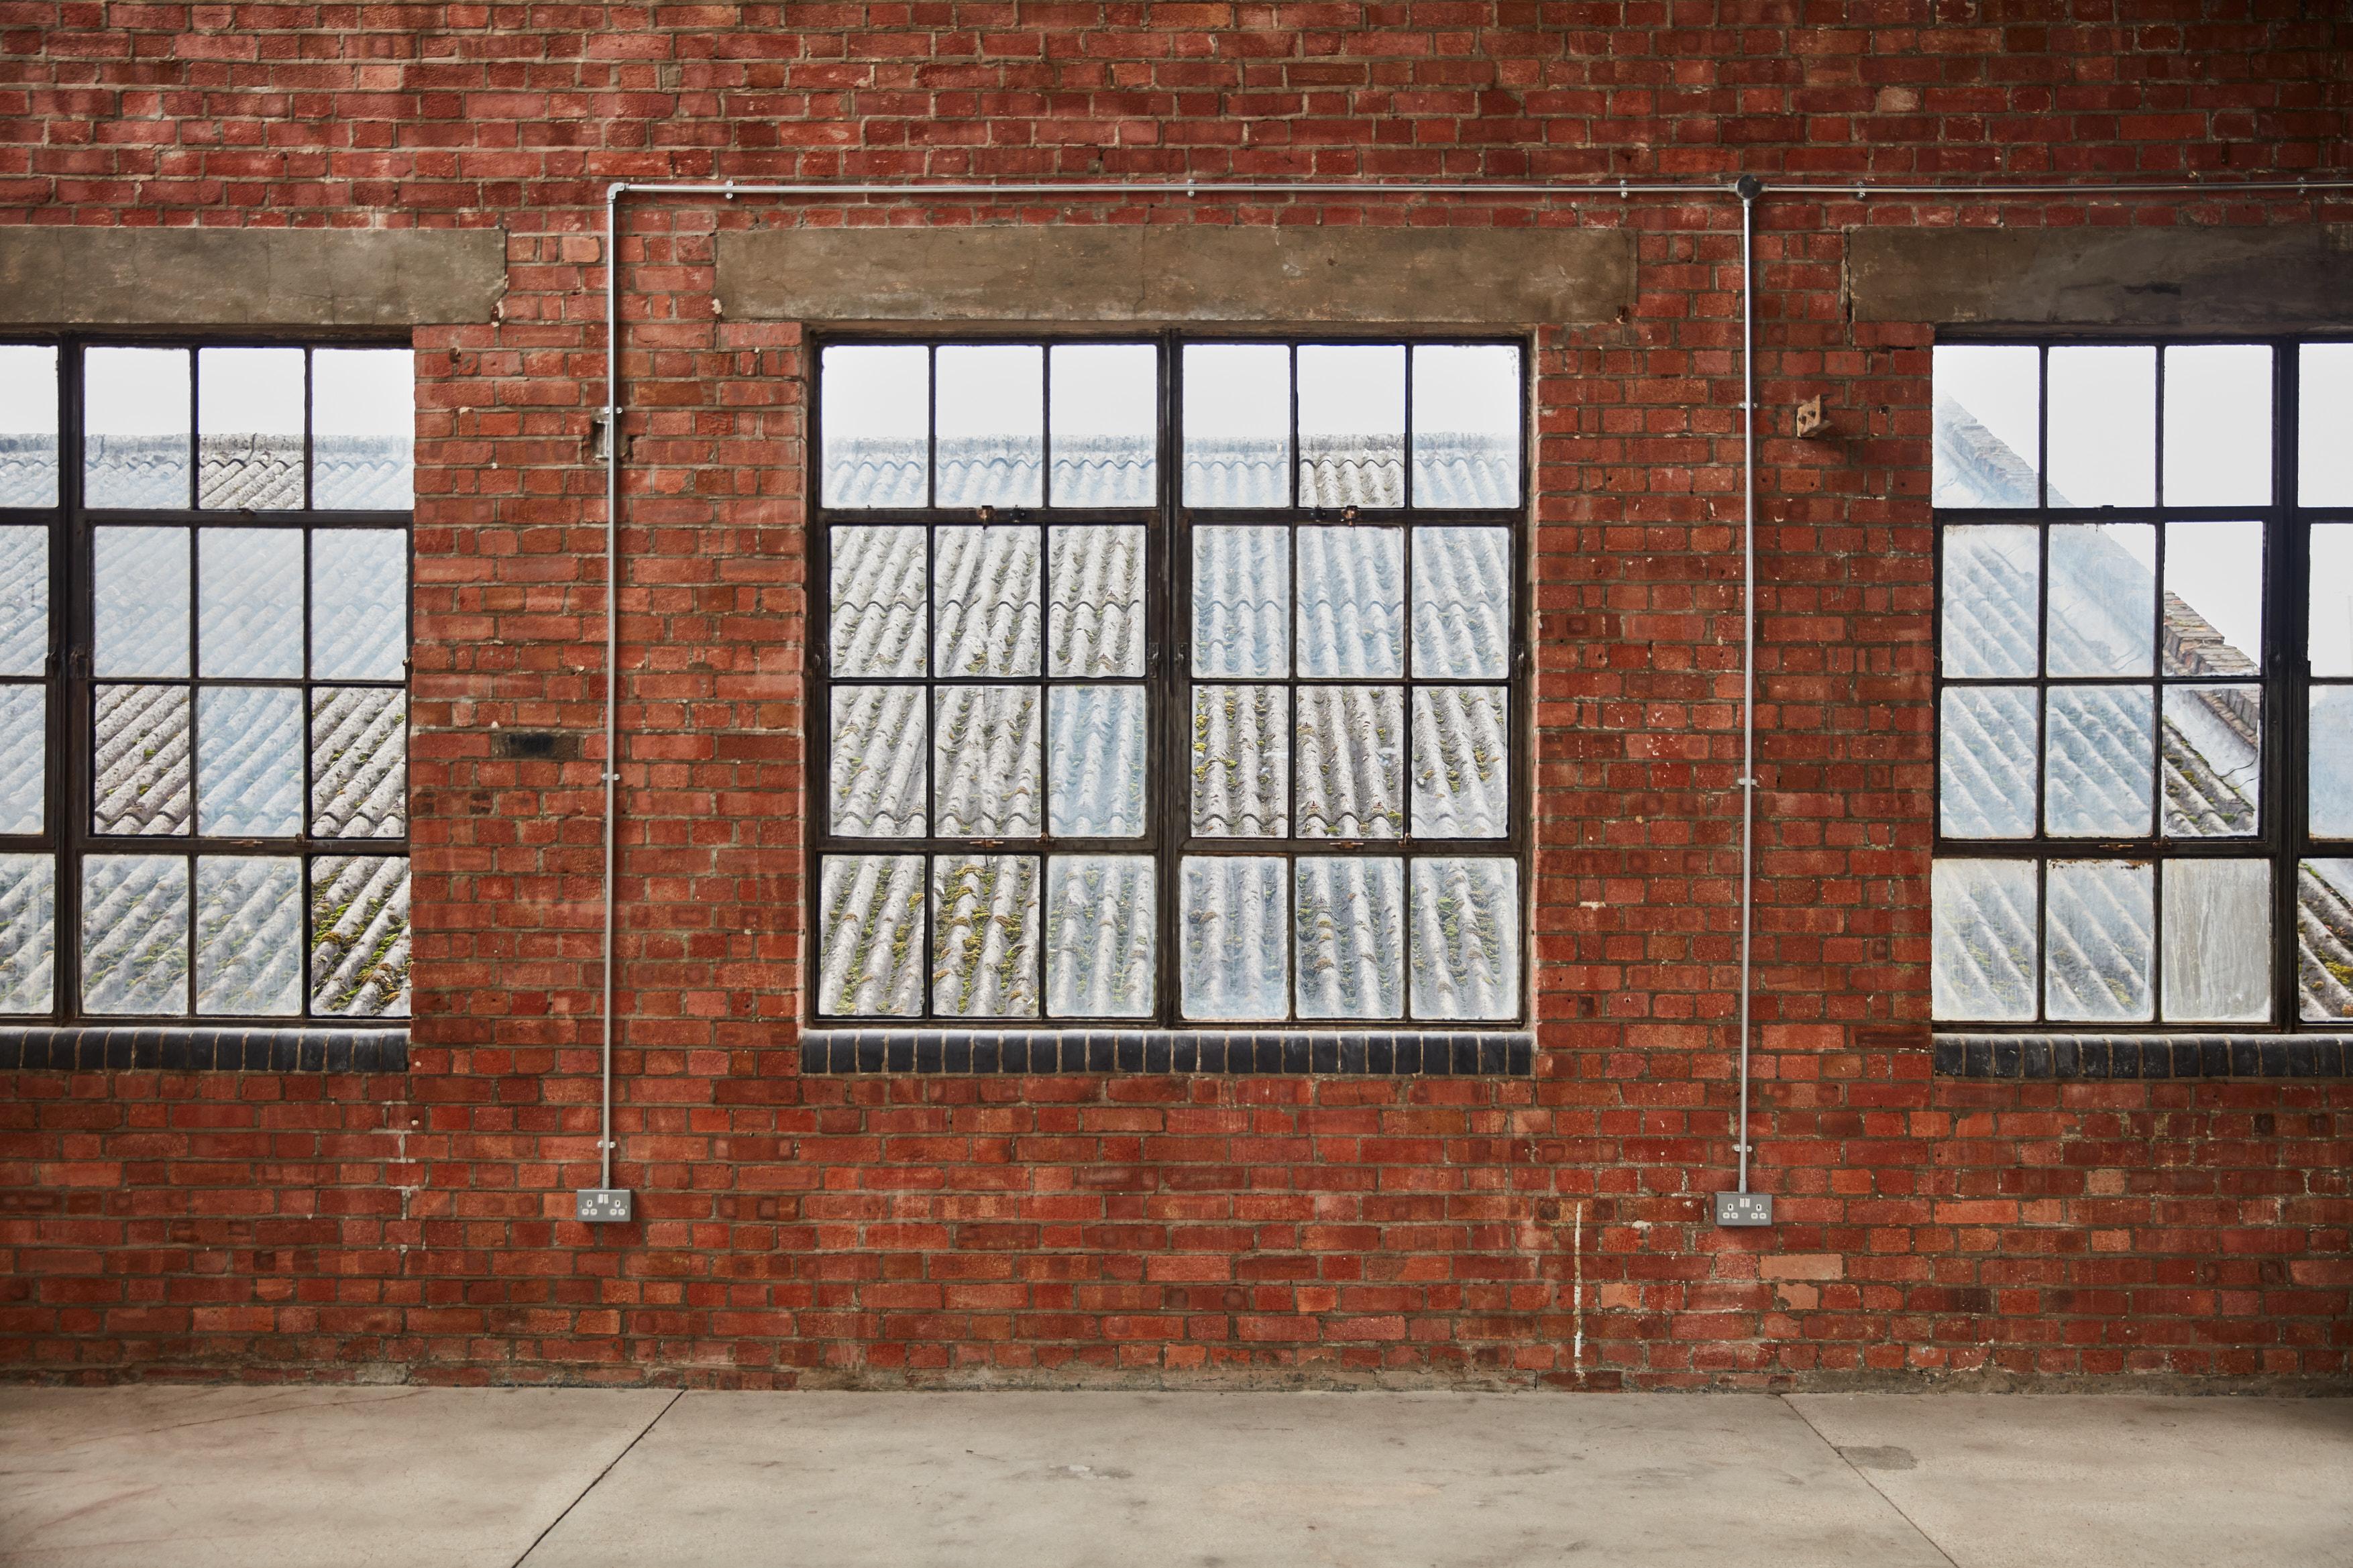 warehouse brickwork and windows